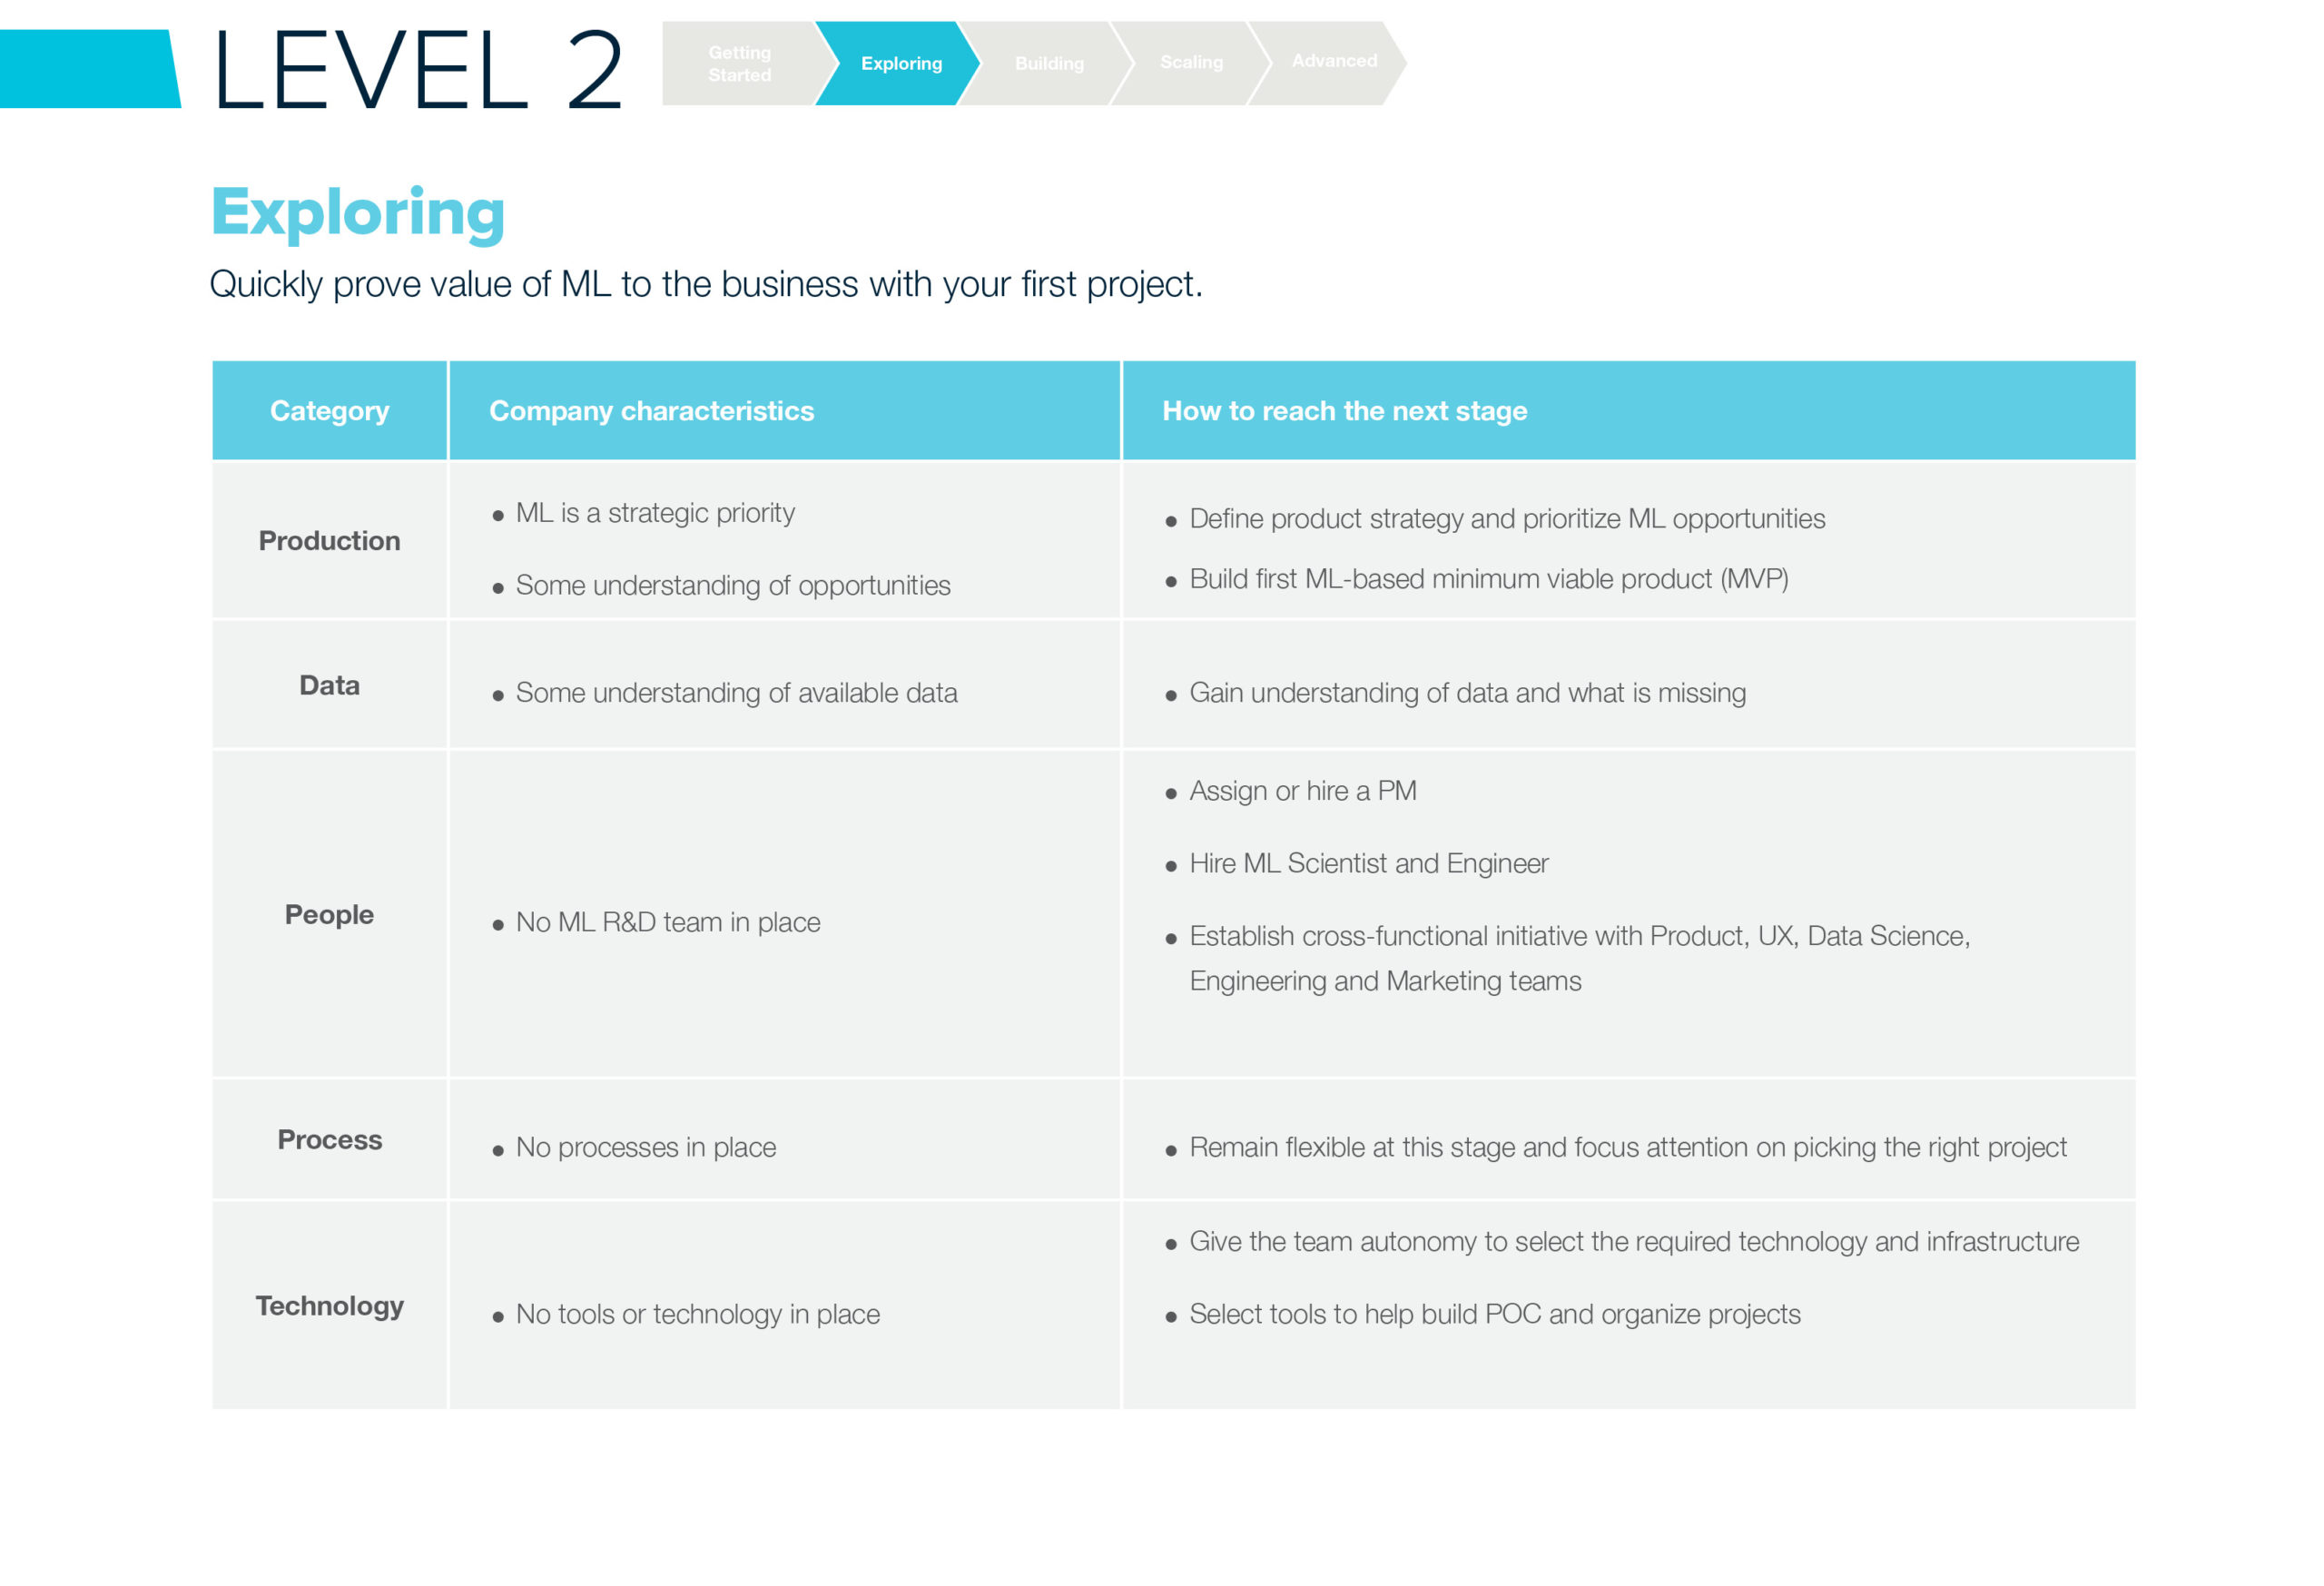 ML Maturity Level 2